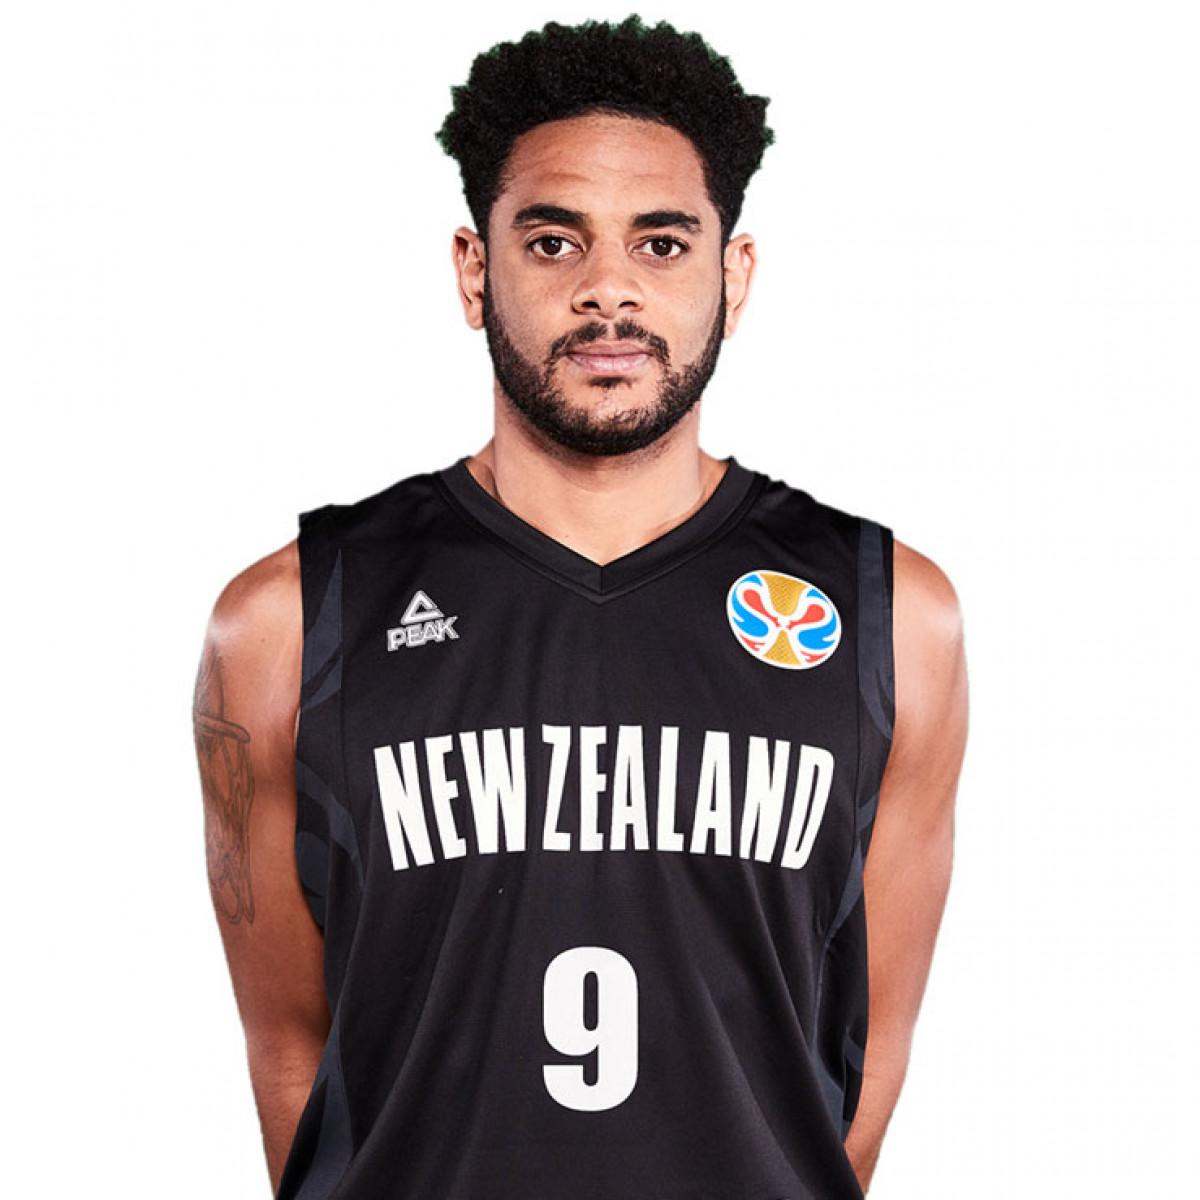 Photo of Corey Webster, 2019-2020 season